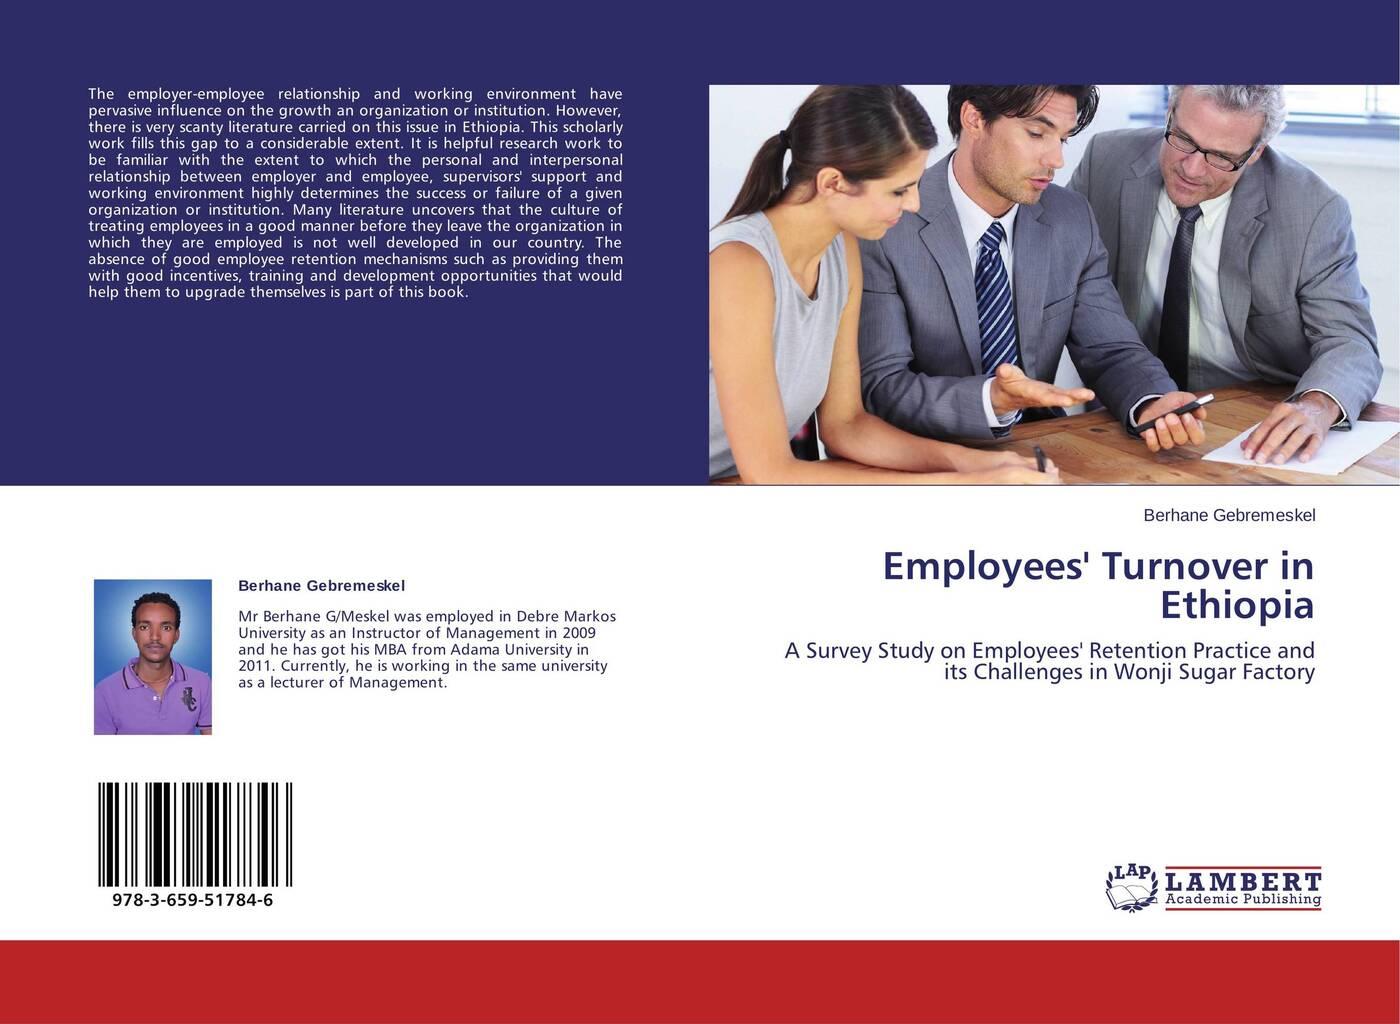 Berhane Gebremeskel Employees' Turnover in Ethiopia fsp151 4f01 pk101v3740i good working tested